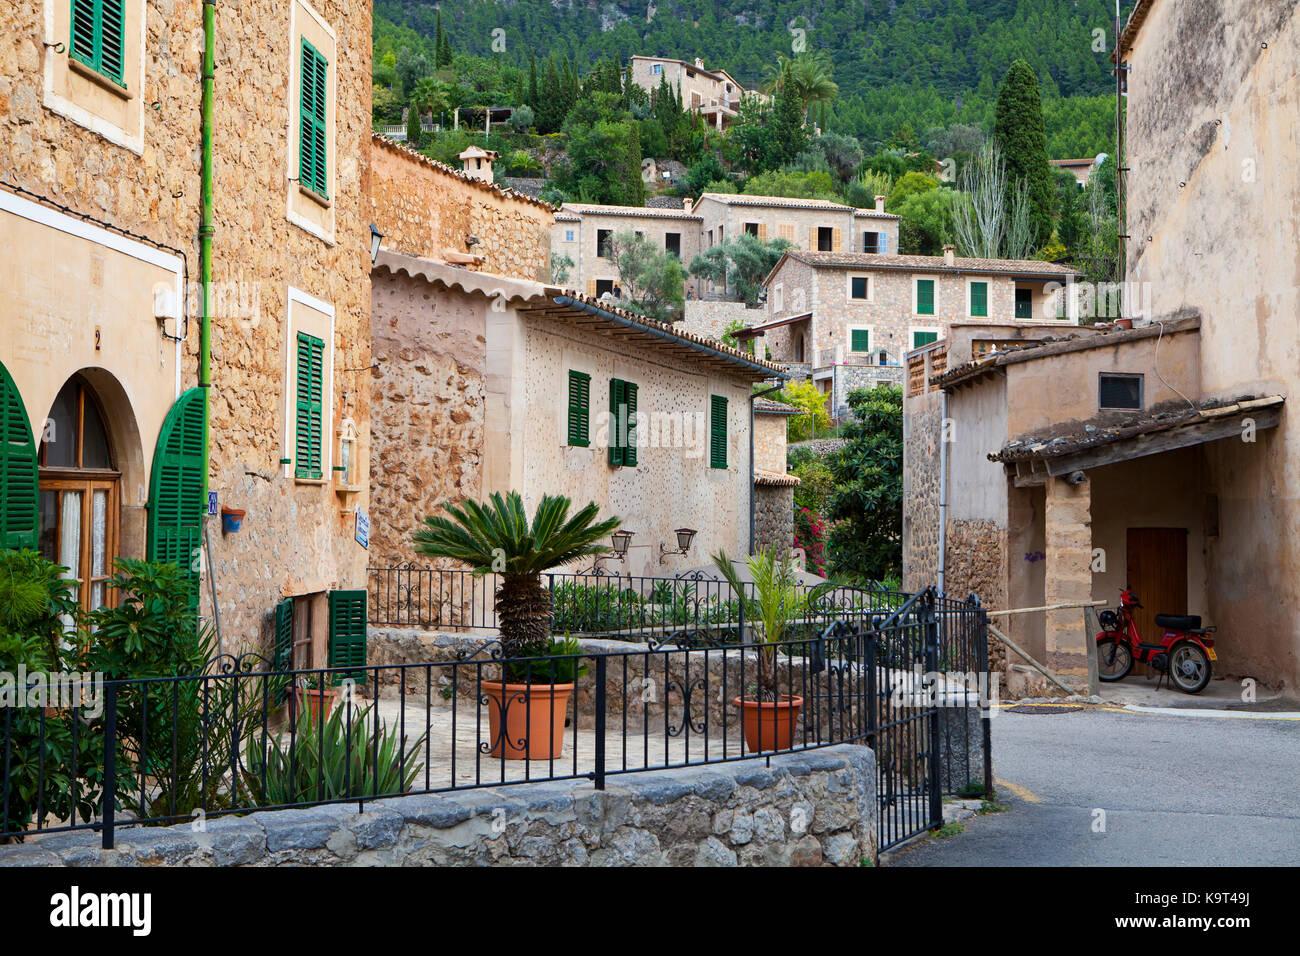 Village de deia Majorque, Espagne Photo Stock